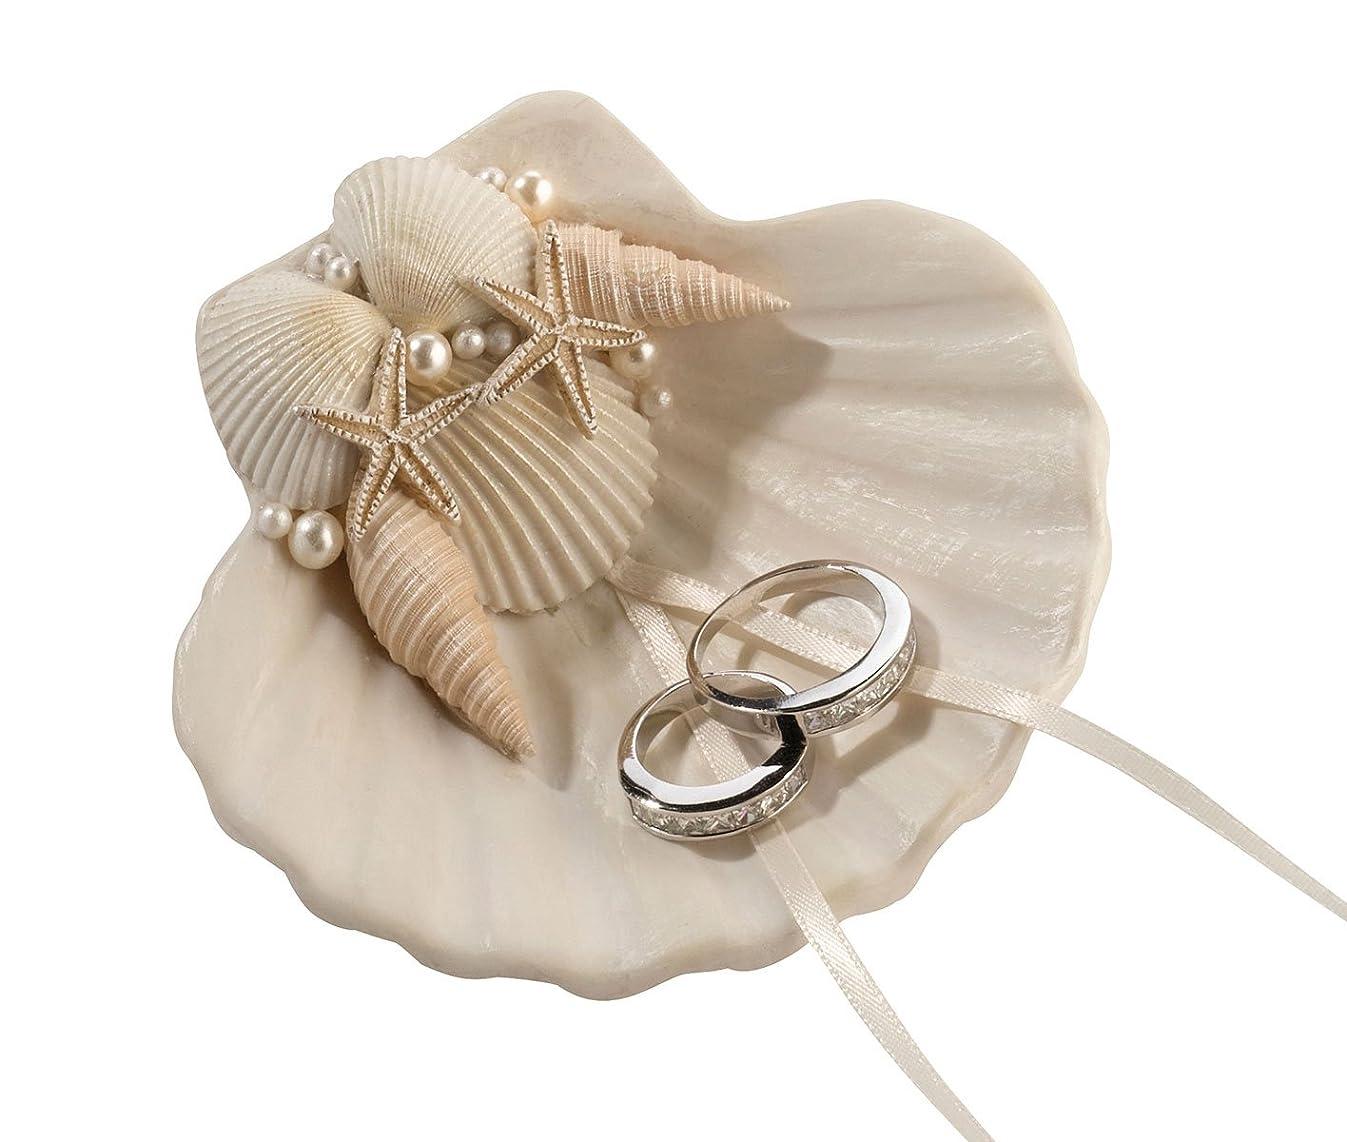 Lillian Rose Fashionable Ring Pillow Alternative Coastal Seashell Holder, Multicolor